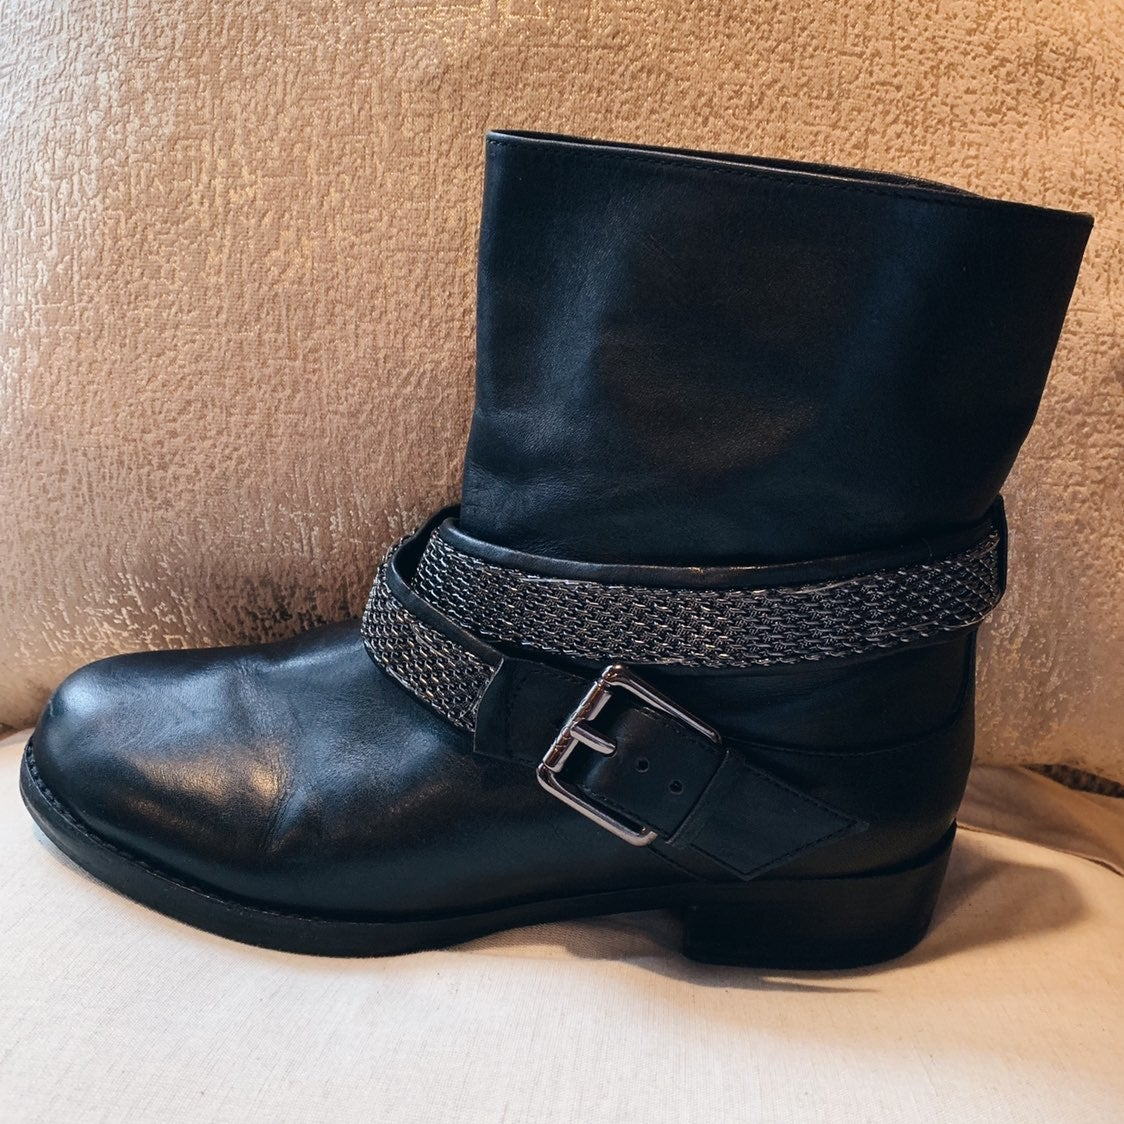 DOLVE VITA BLACK ANKLE BOOTS